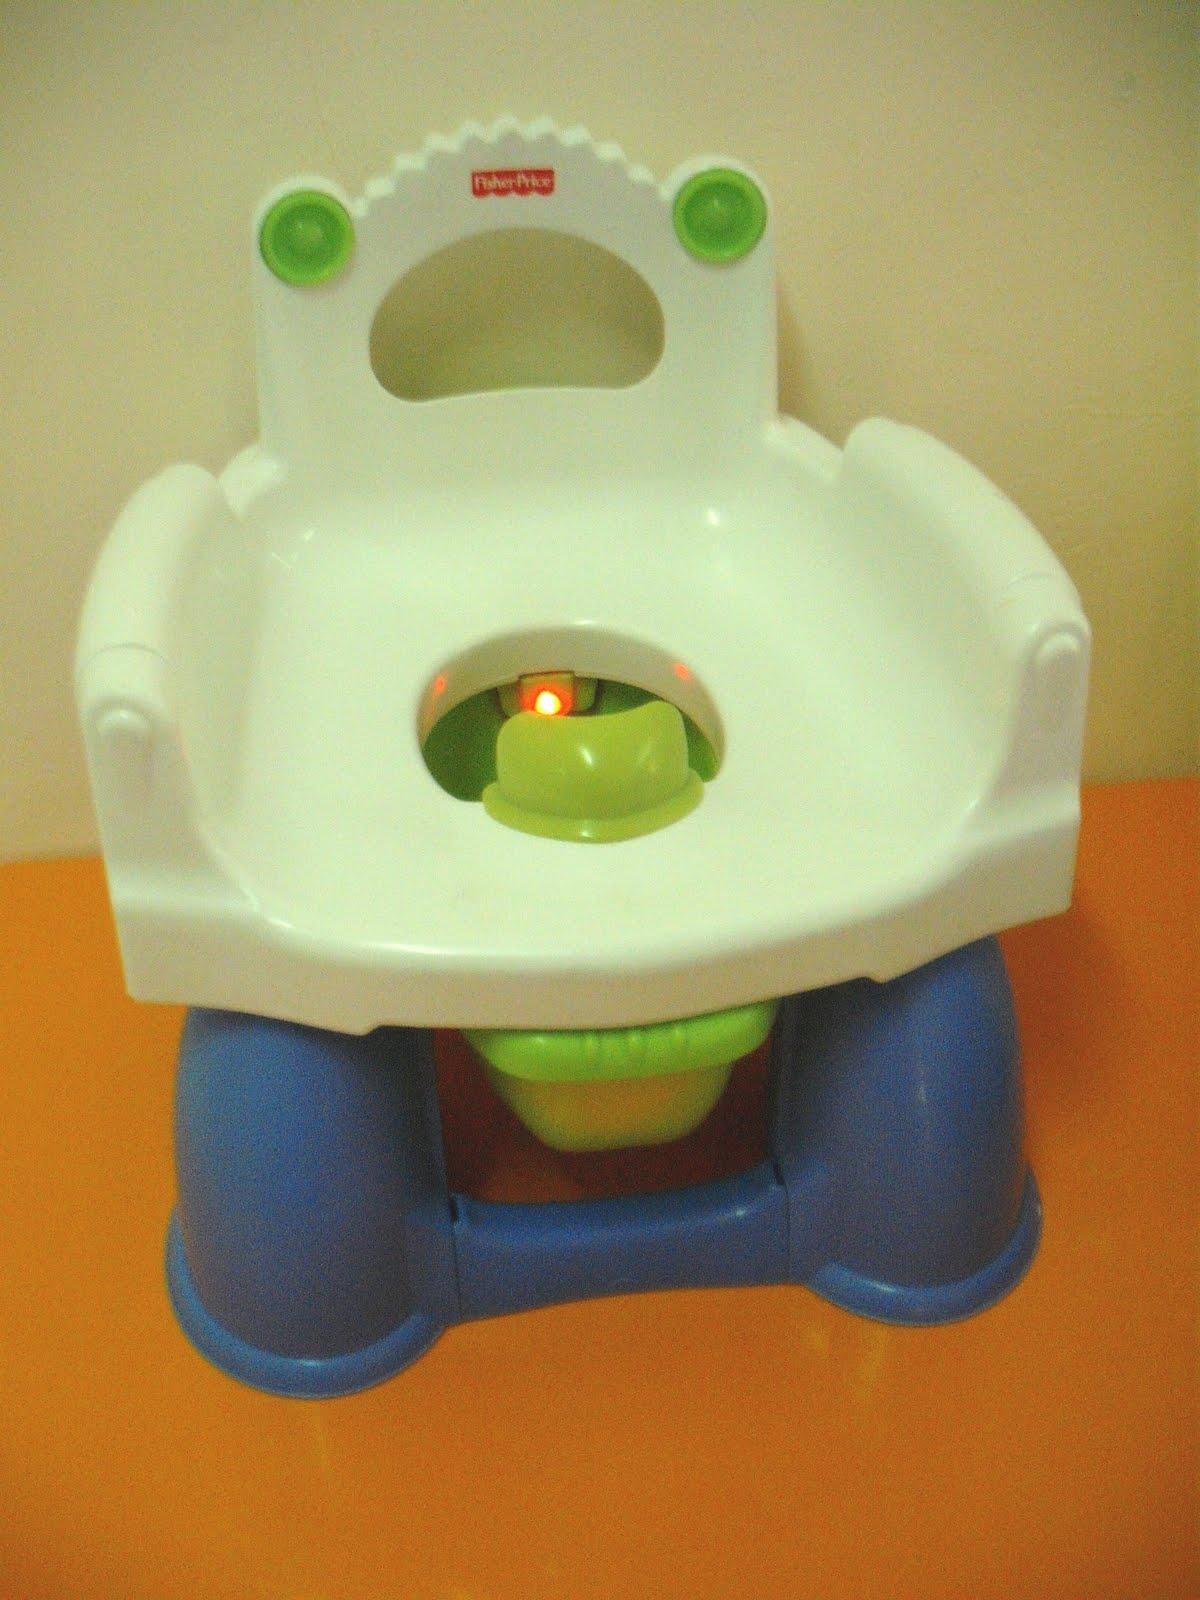 Singing Potty Chair Fuzzy Office Jualan Barangan Bayi Dan Kanak Preloved Fisher